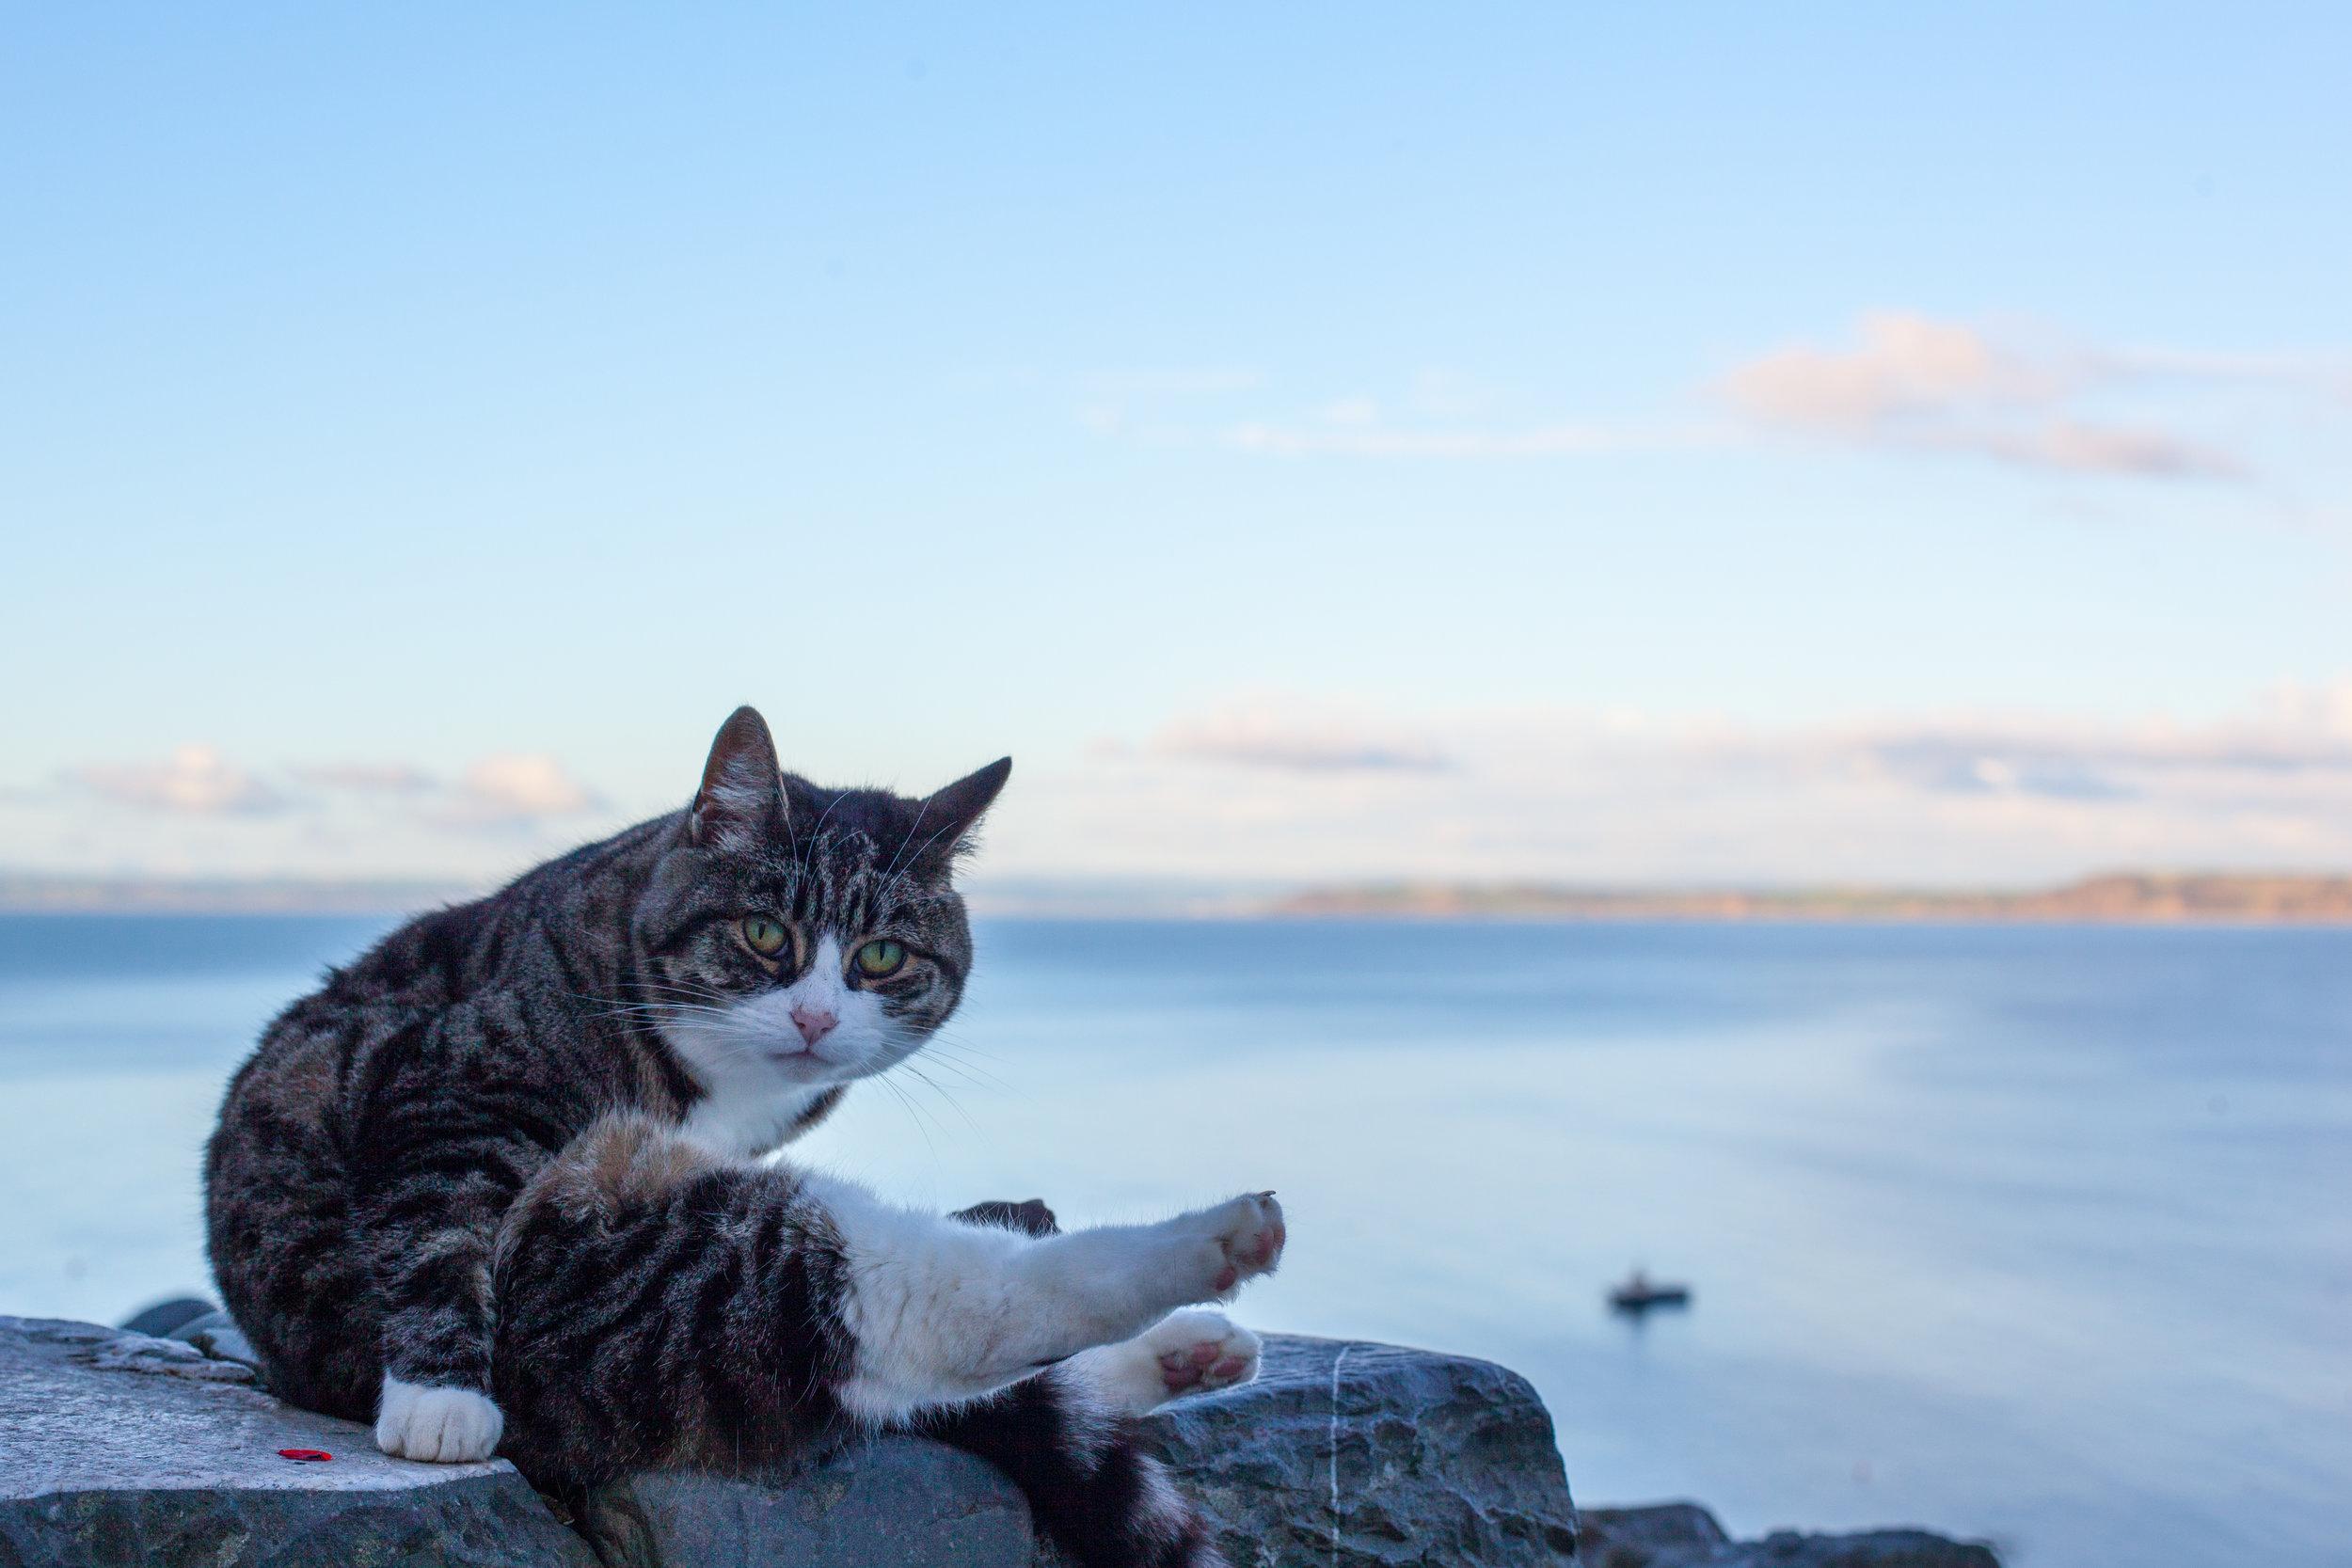 A cat at sunset overlooking Clovelly beach in Devon.